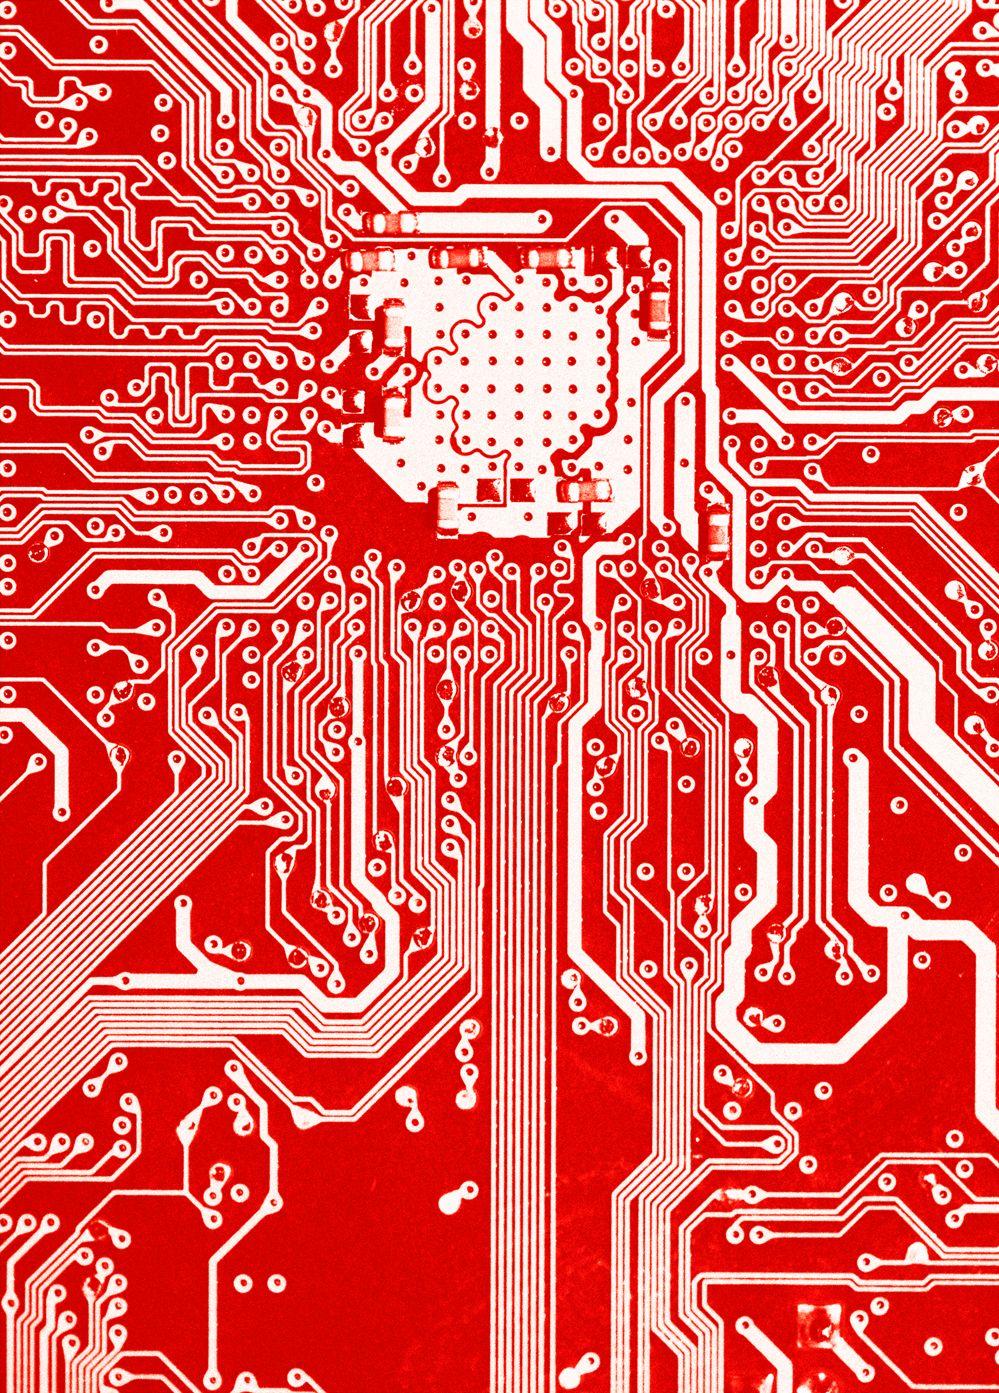 Pin By Cano X On Platform Game Art Google Tech Art Circuit Design